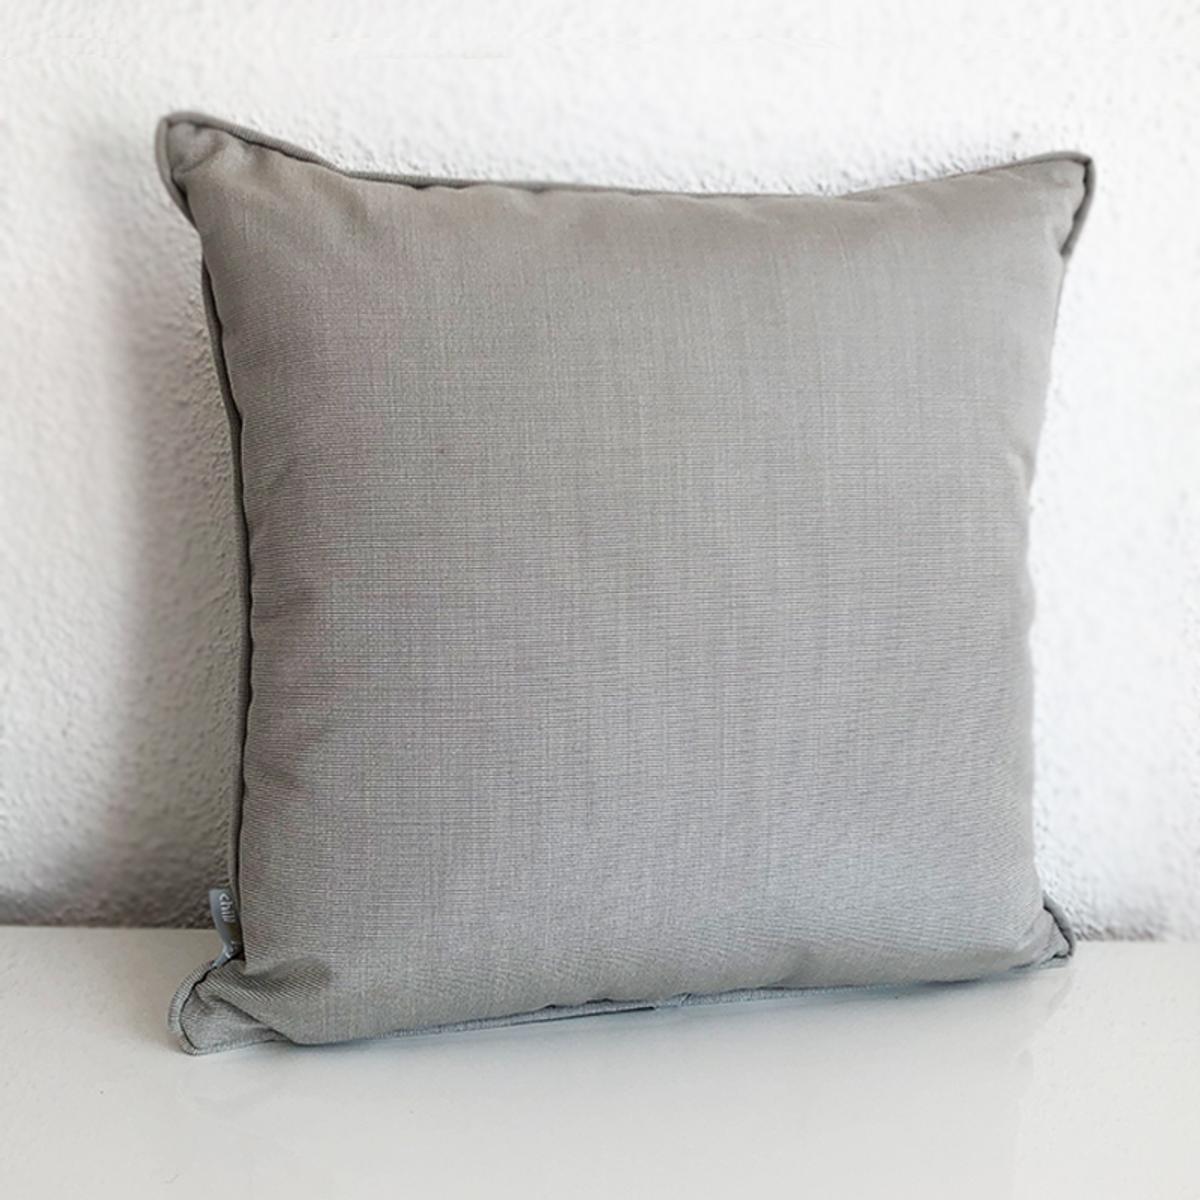 Gray Outdoor Cushion Shingles Summertime Classic